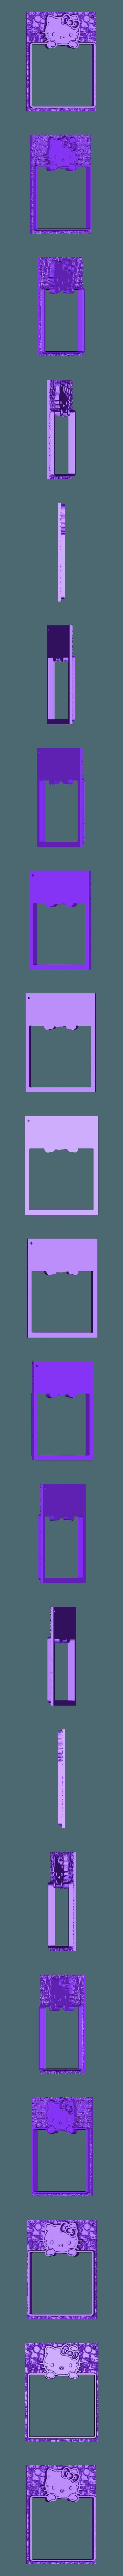 hellokittyalto.stl Download free STL file HELLO KITTY customizable frame lithophane • Template to 3D print, 3dlito